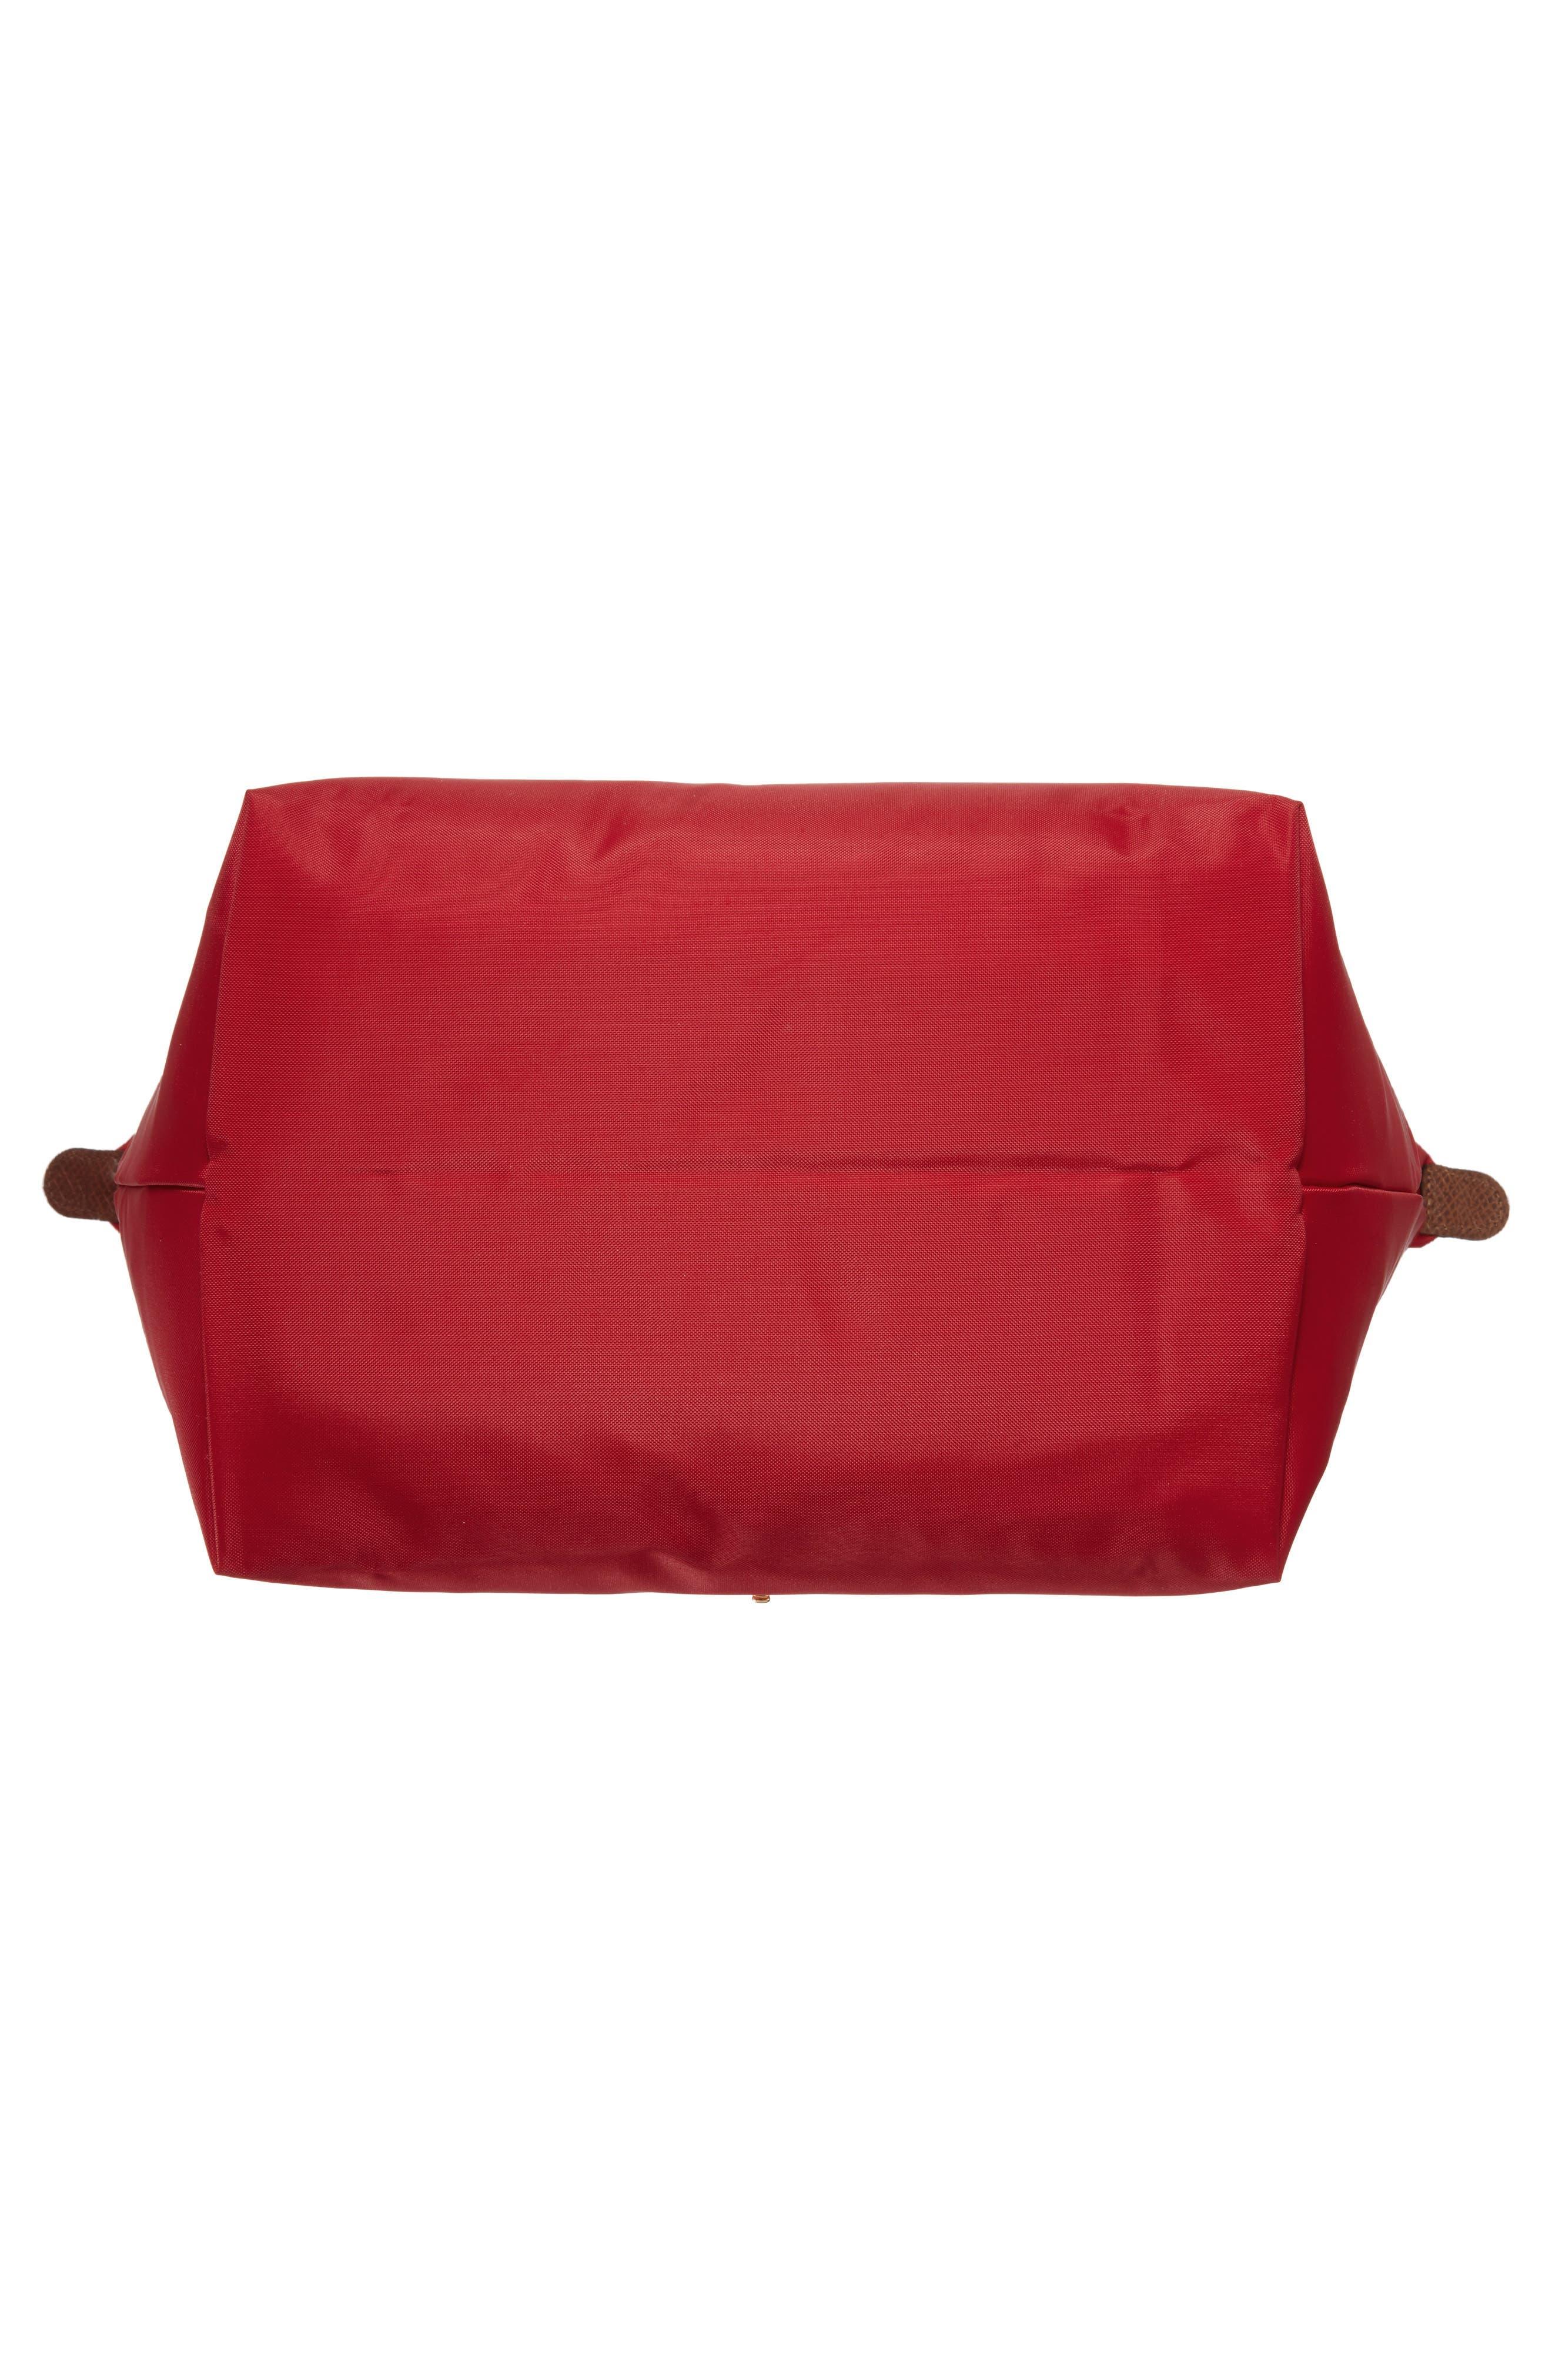 'Medium Le Pliage' Top Handle Tote,                             Alternate thumbnail 6, color,                             RED